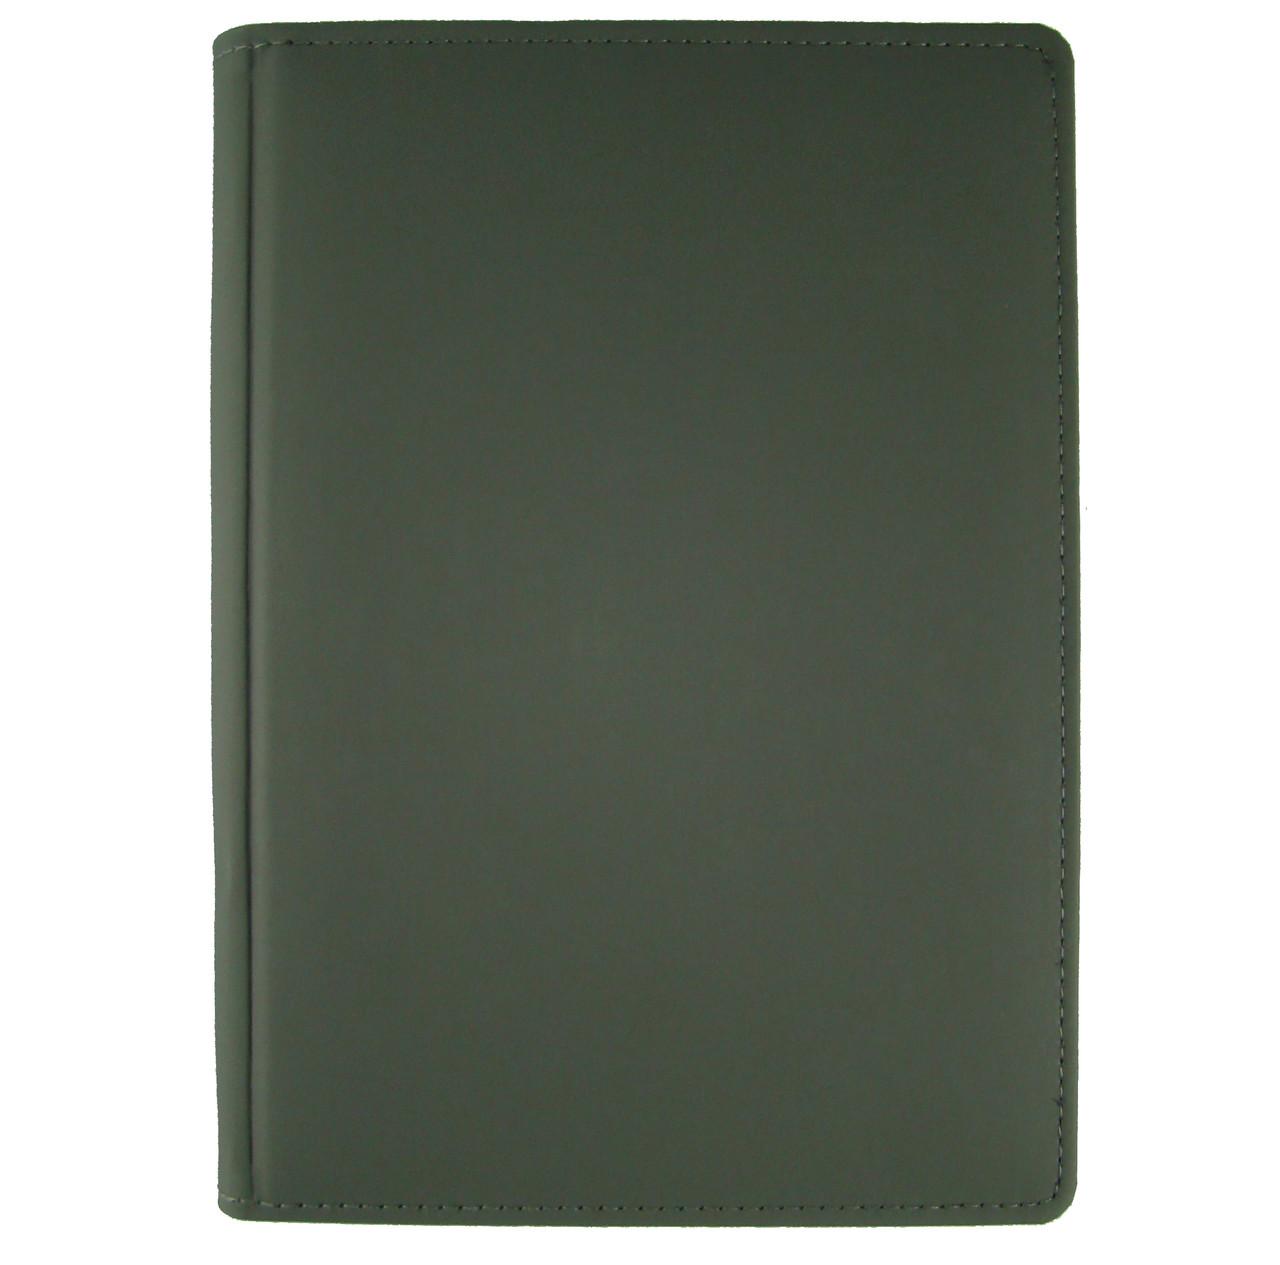 Ежедневник недатированный BRISK Vienna Стандарт А5(14,2х20,3) серый